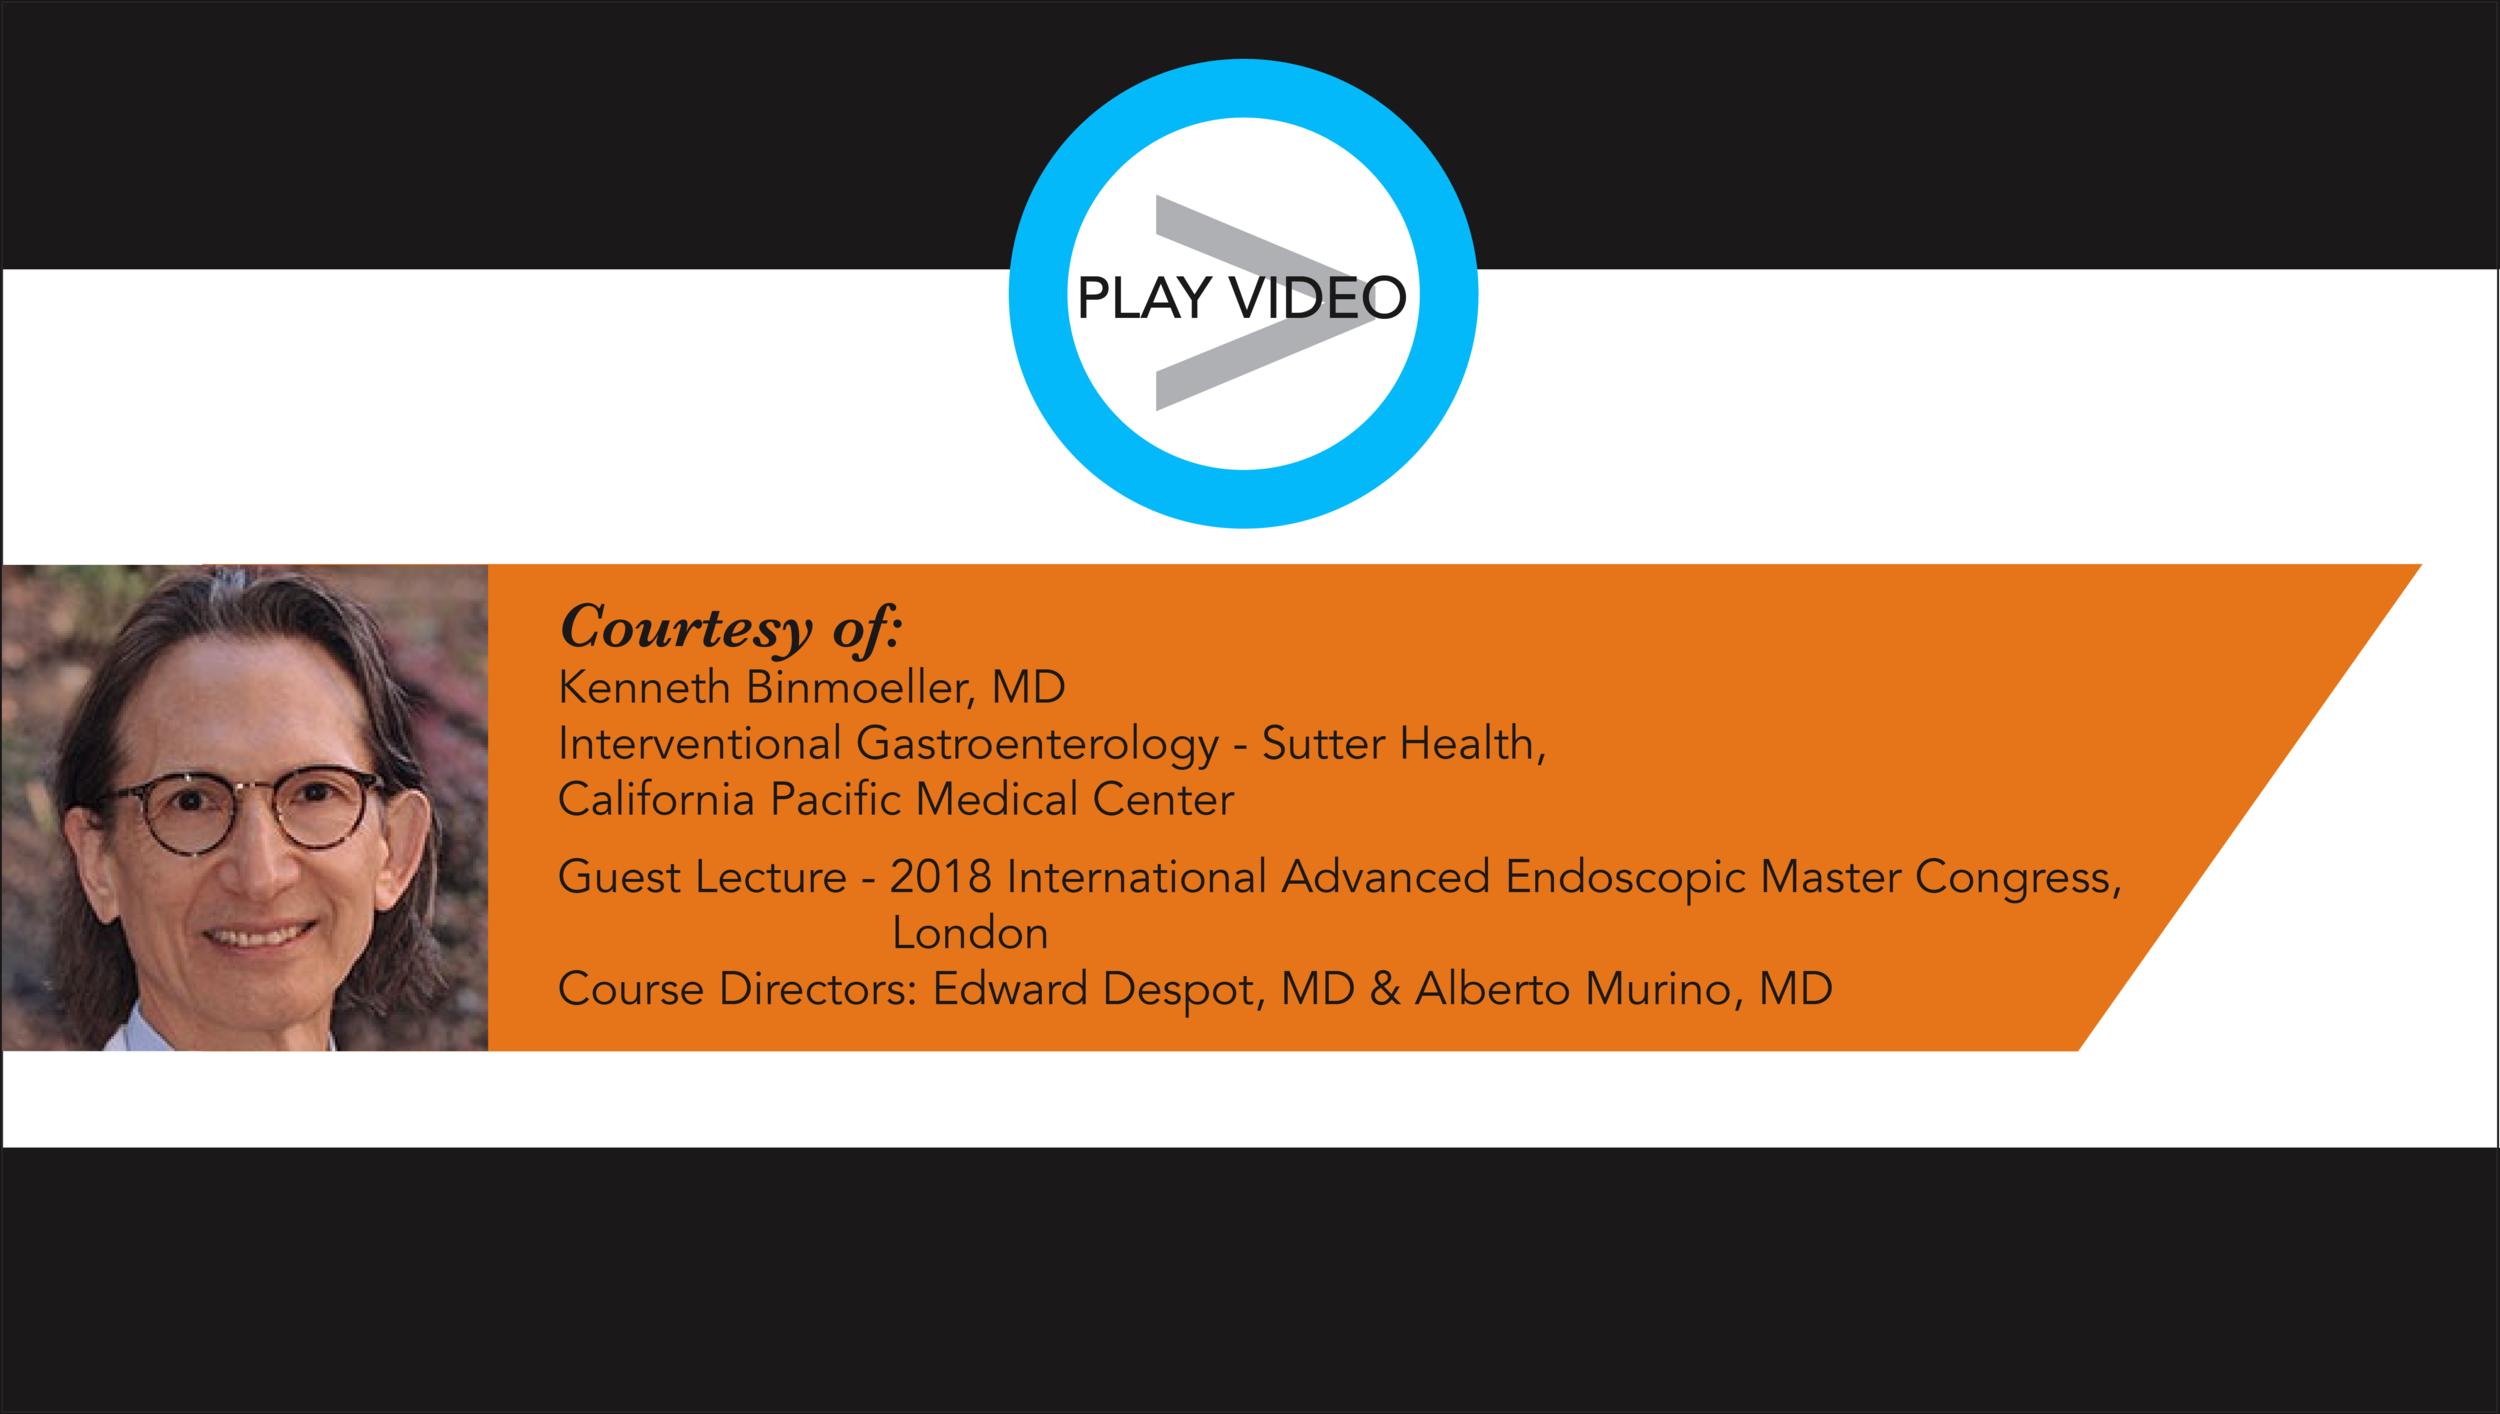 DR_Binmoeller_video_graphic.png